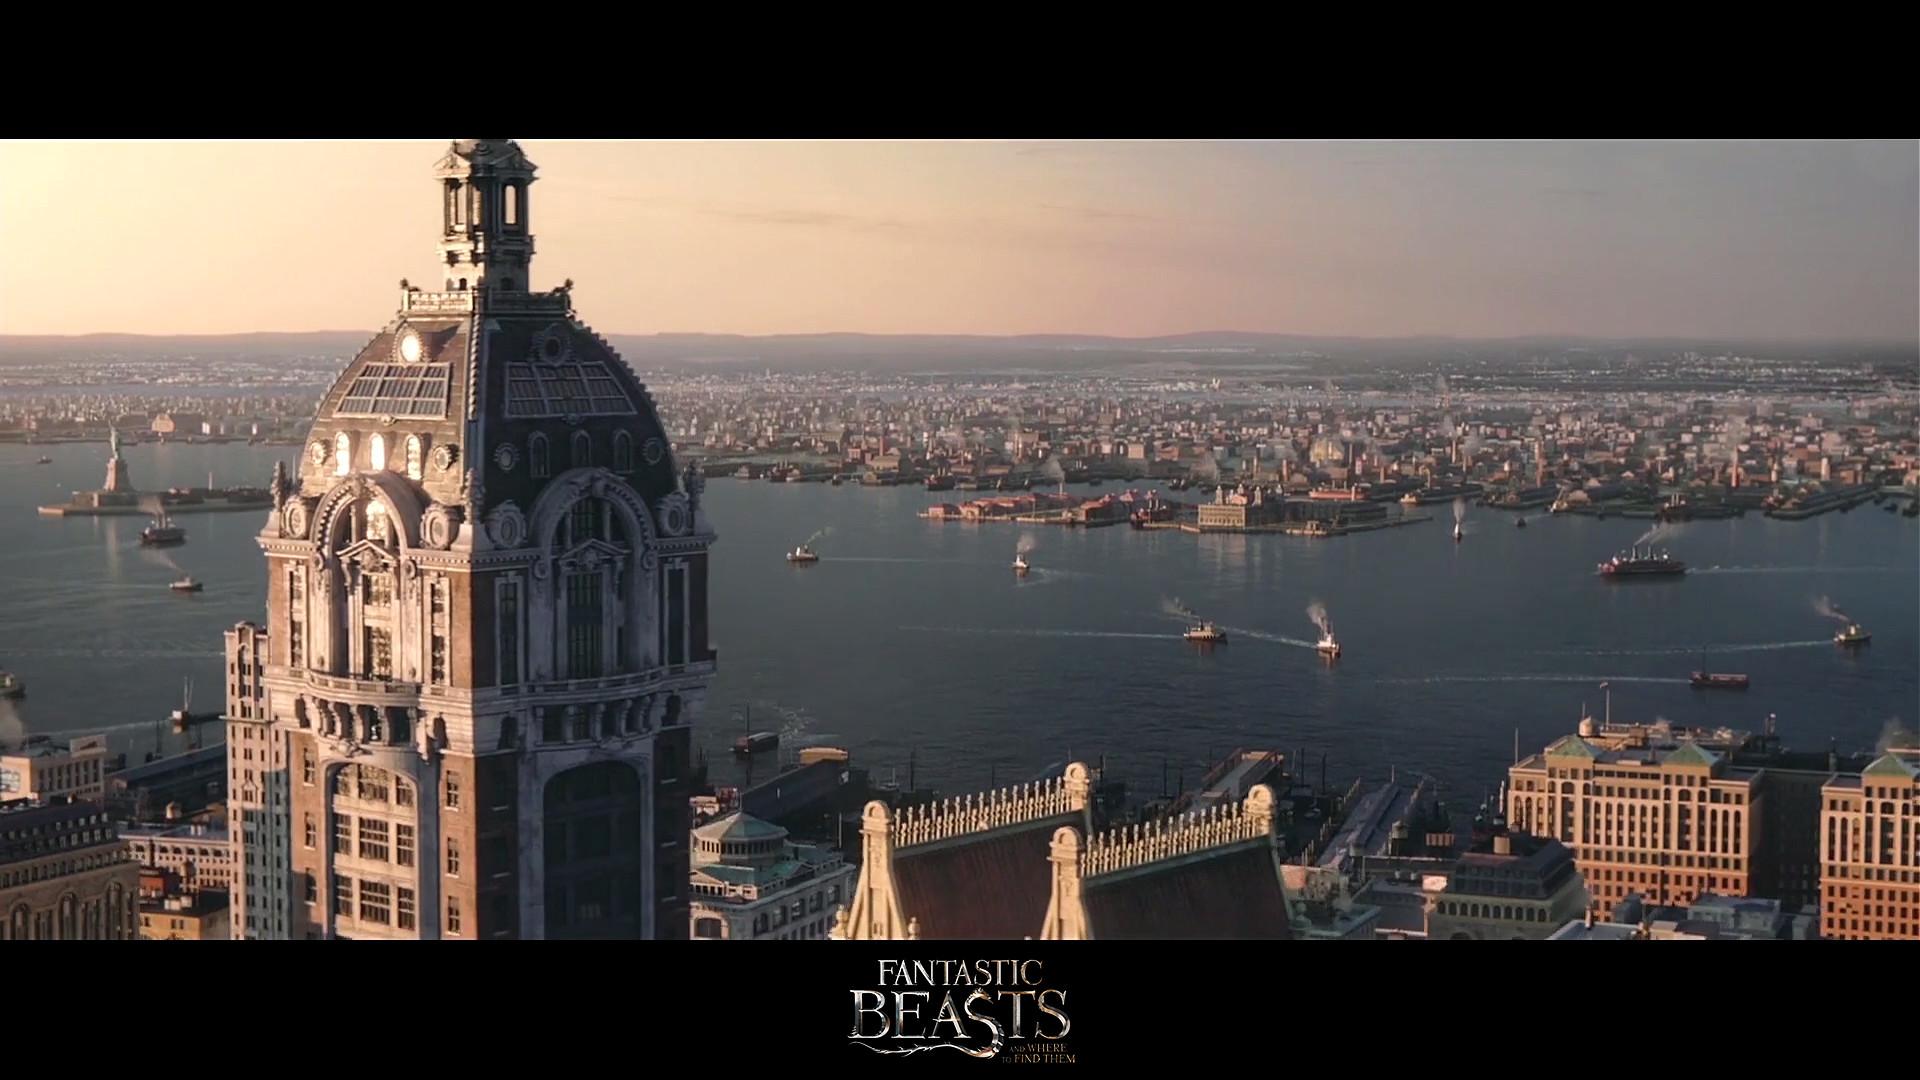 Fantastic Beasts - Environment Modeling / Texturing